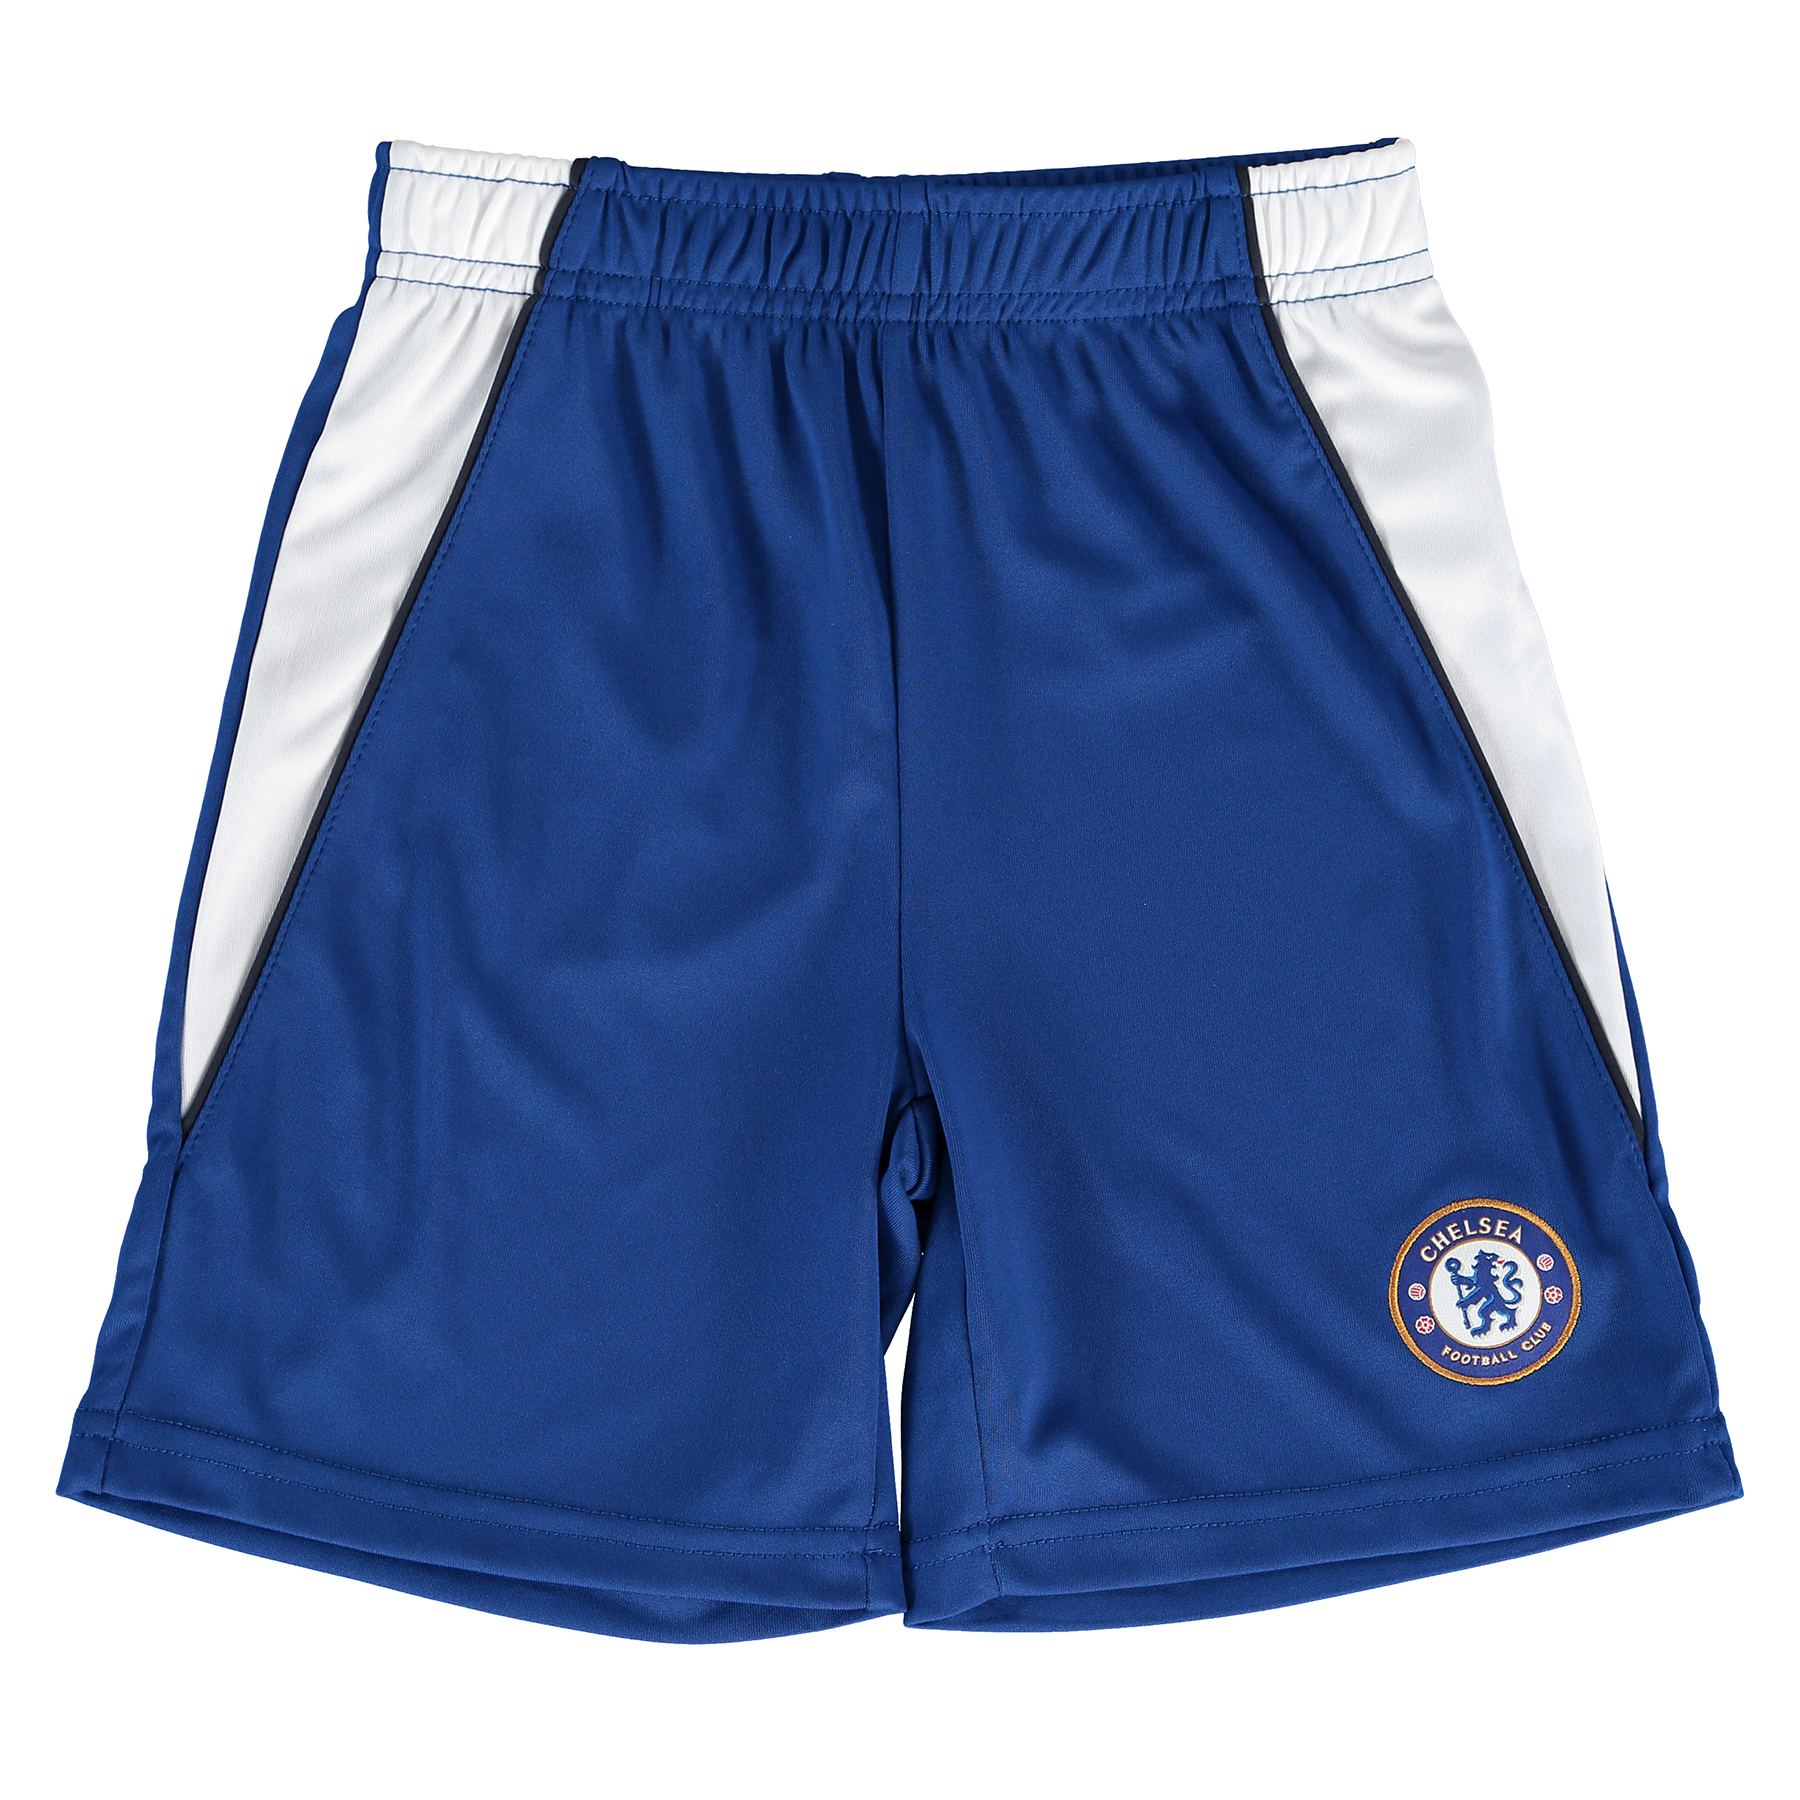 Chelsea Classic Basketball Shorts - Royal - Boys